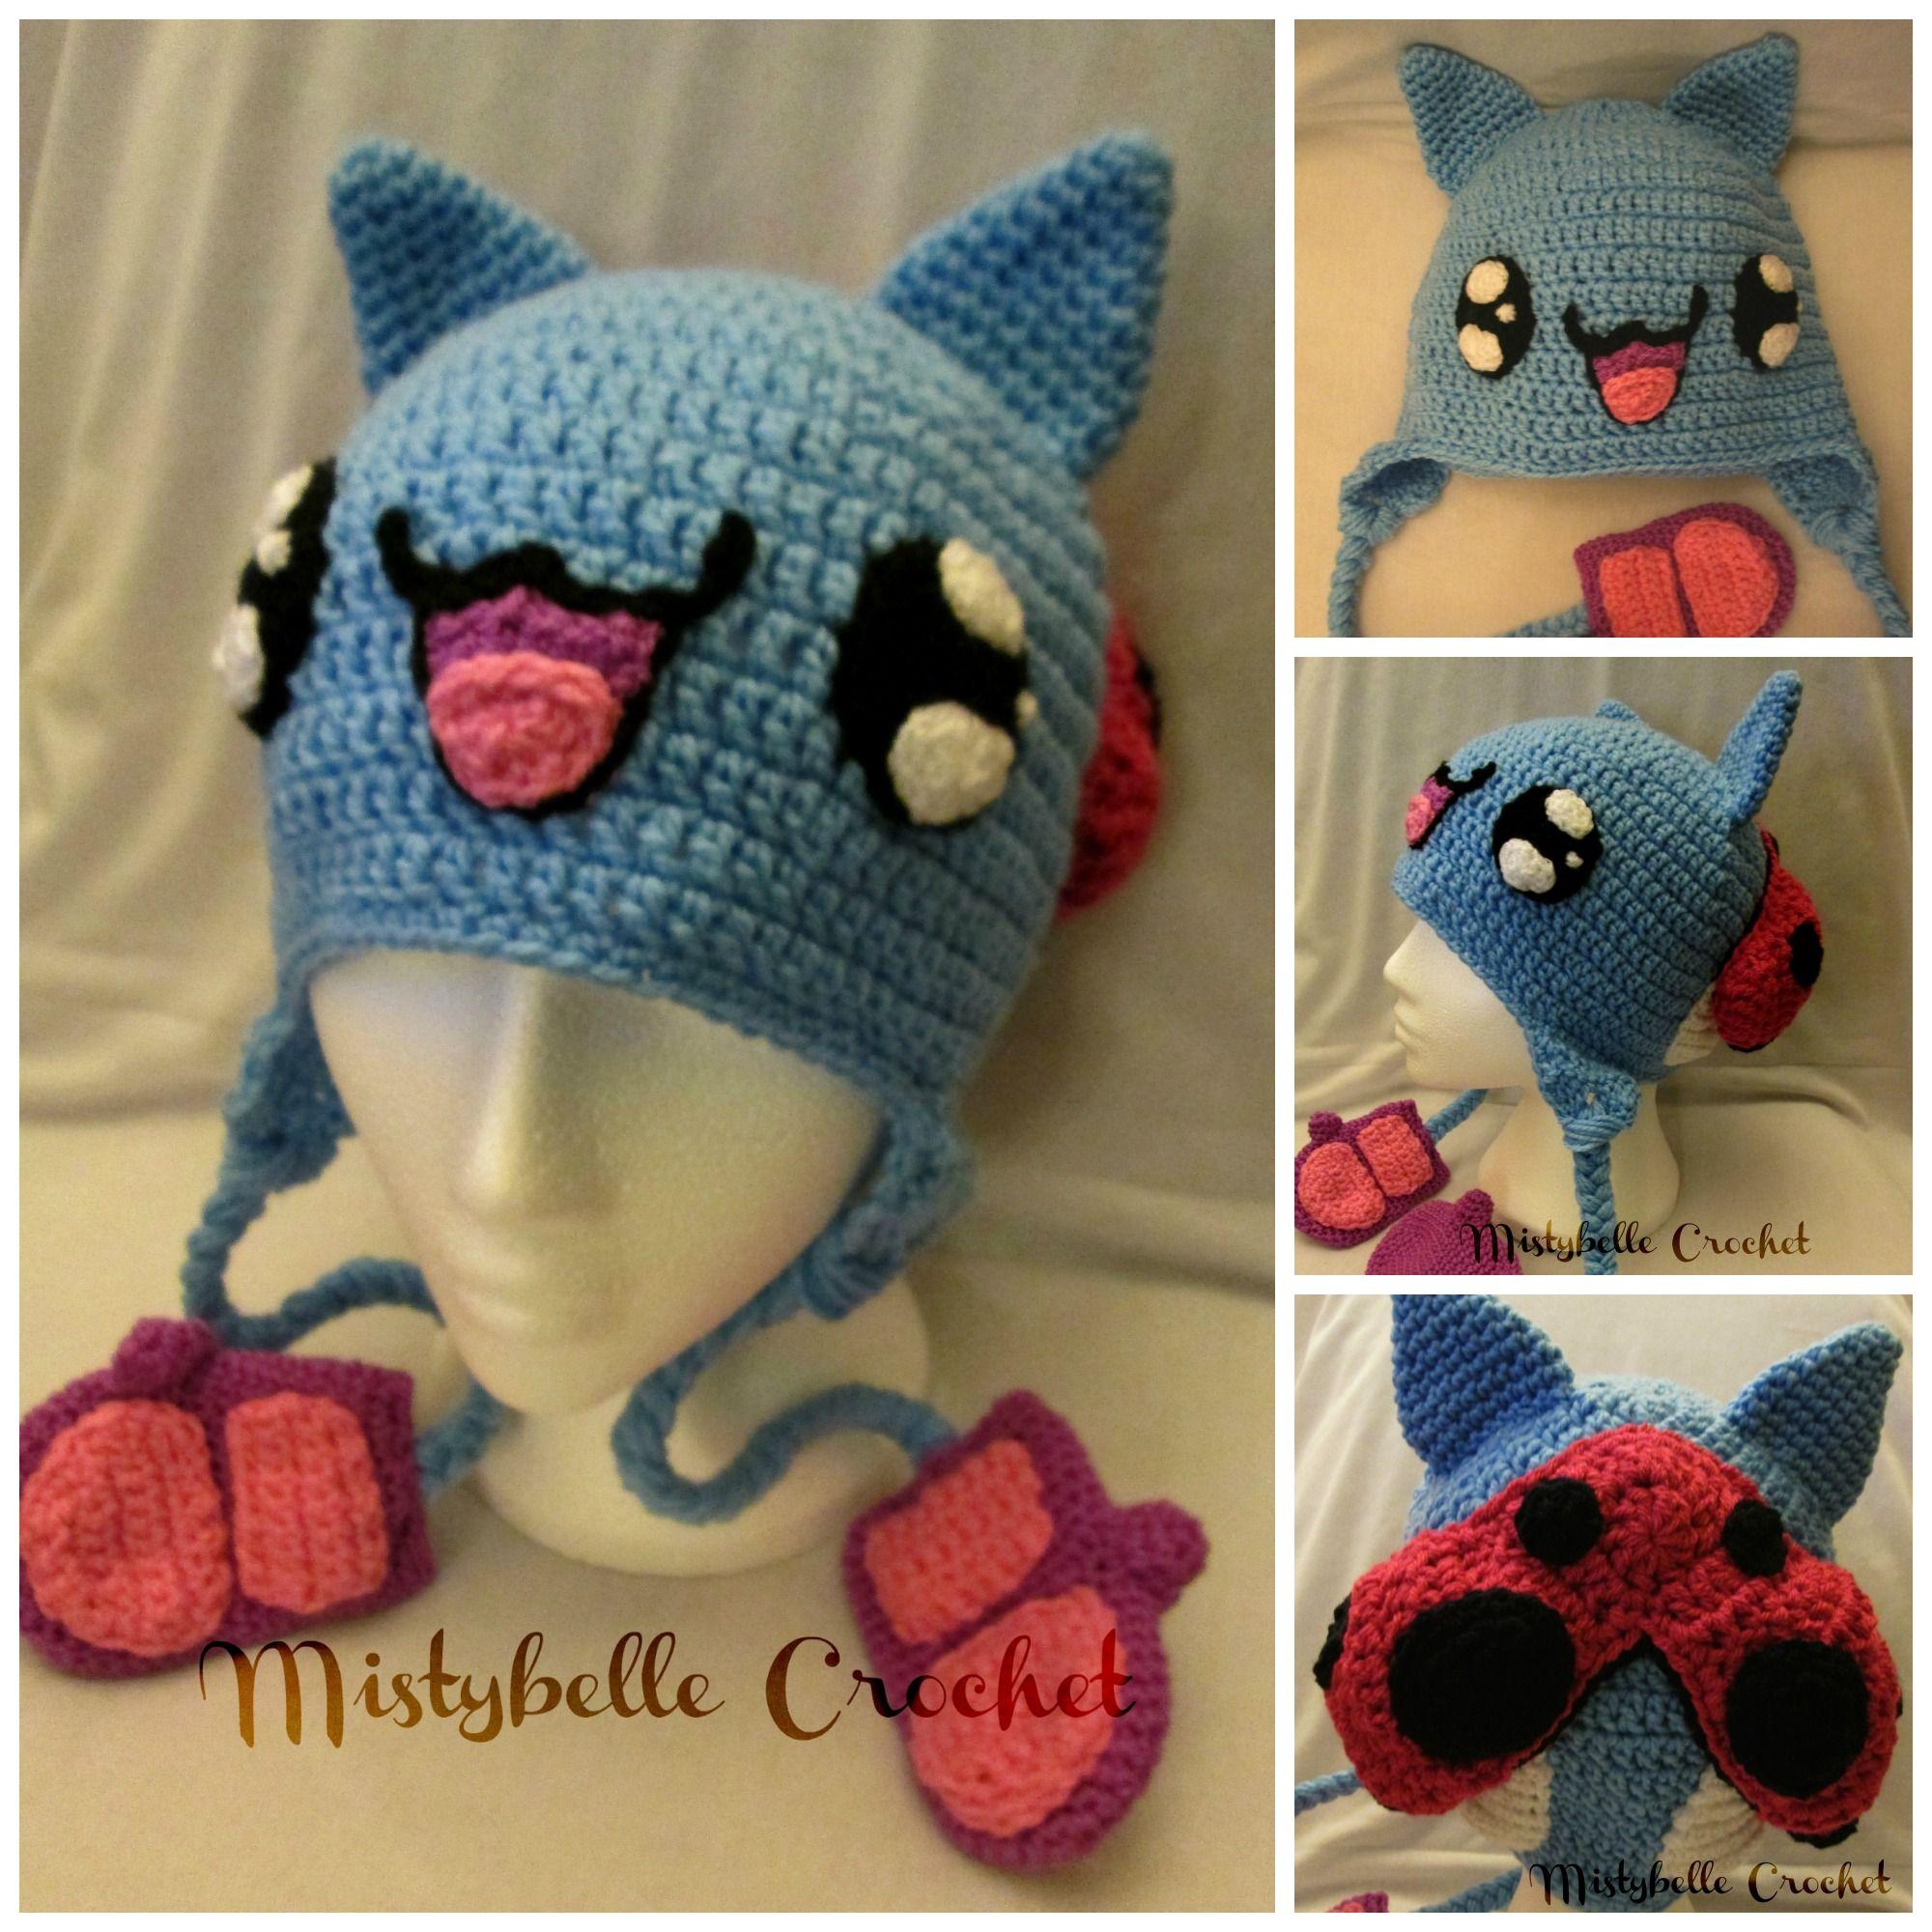 Catbug Crochet Hat Happy Knitting Pinterest Crochet Hats